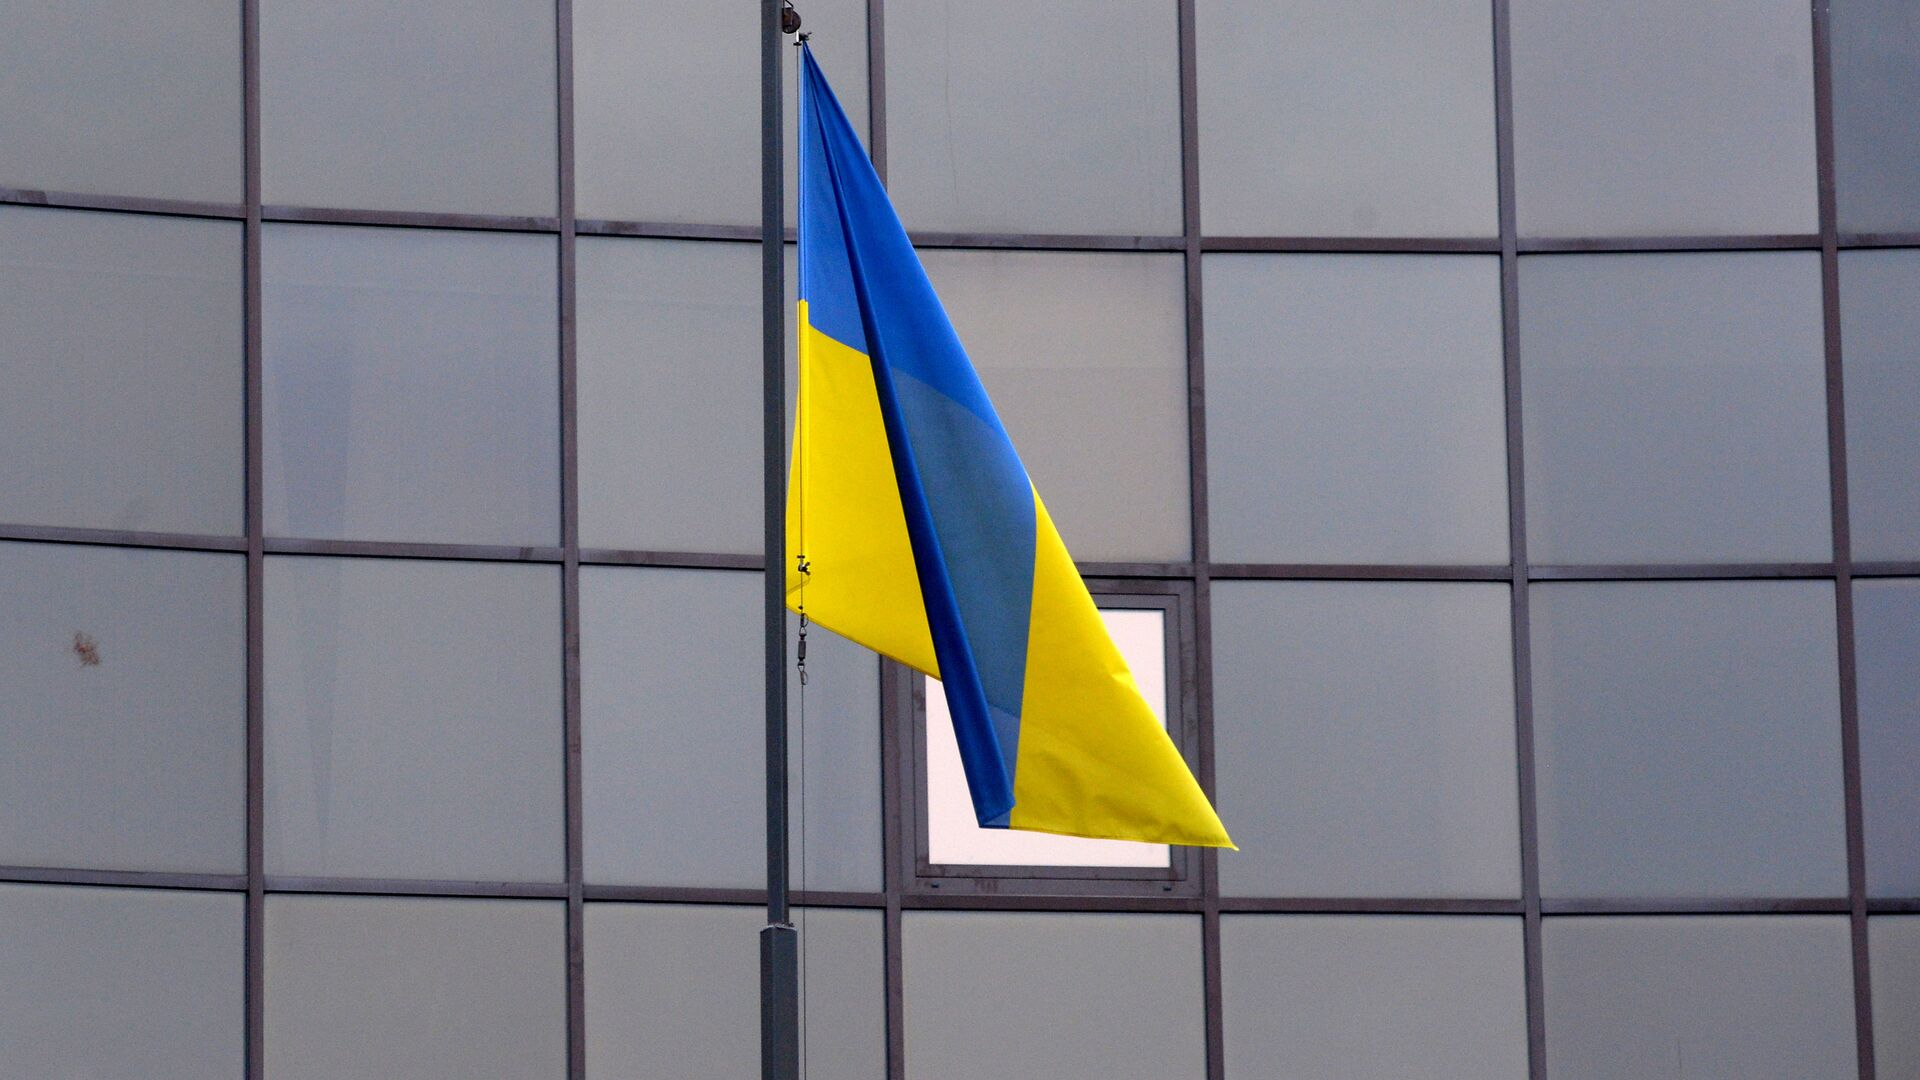 La bandera de Ucrania - Sputnik Mundo, 1920, 10.02.2021